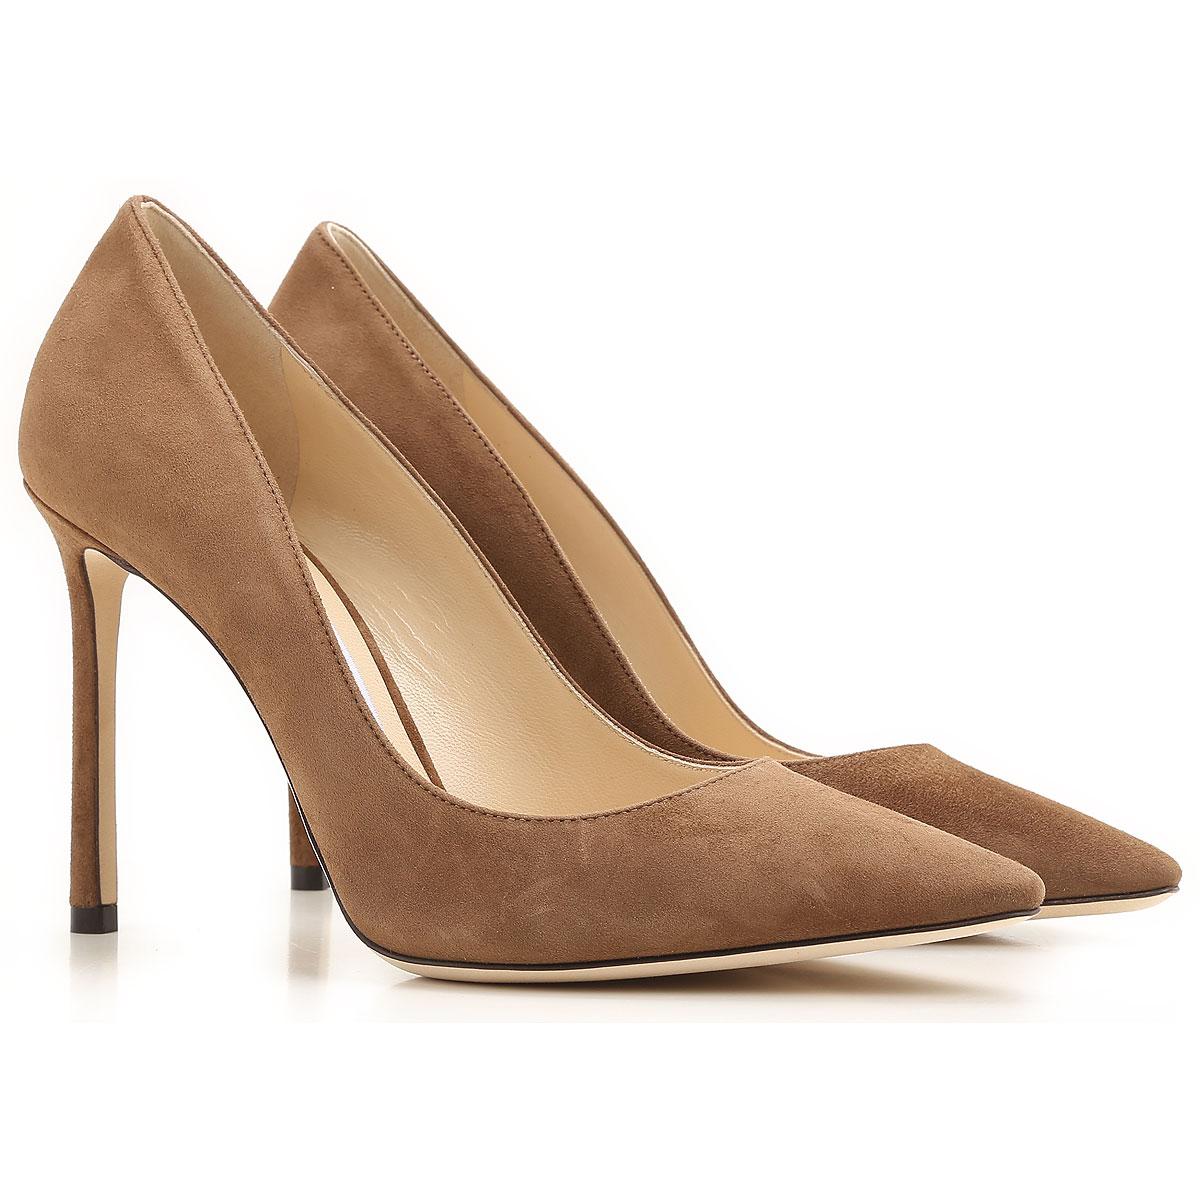 chaussures femme jimmy choo code produit romy 100 suede. Black Bedroom Furniture Sets. Home Design Ideas